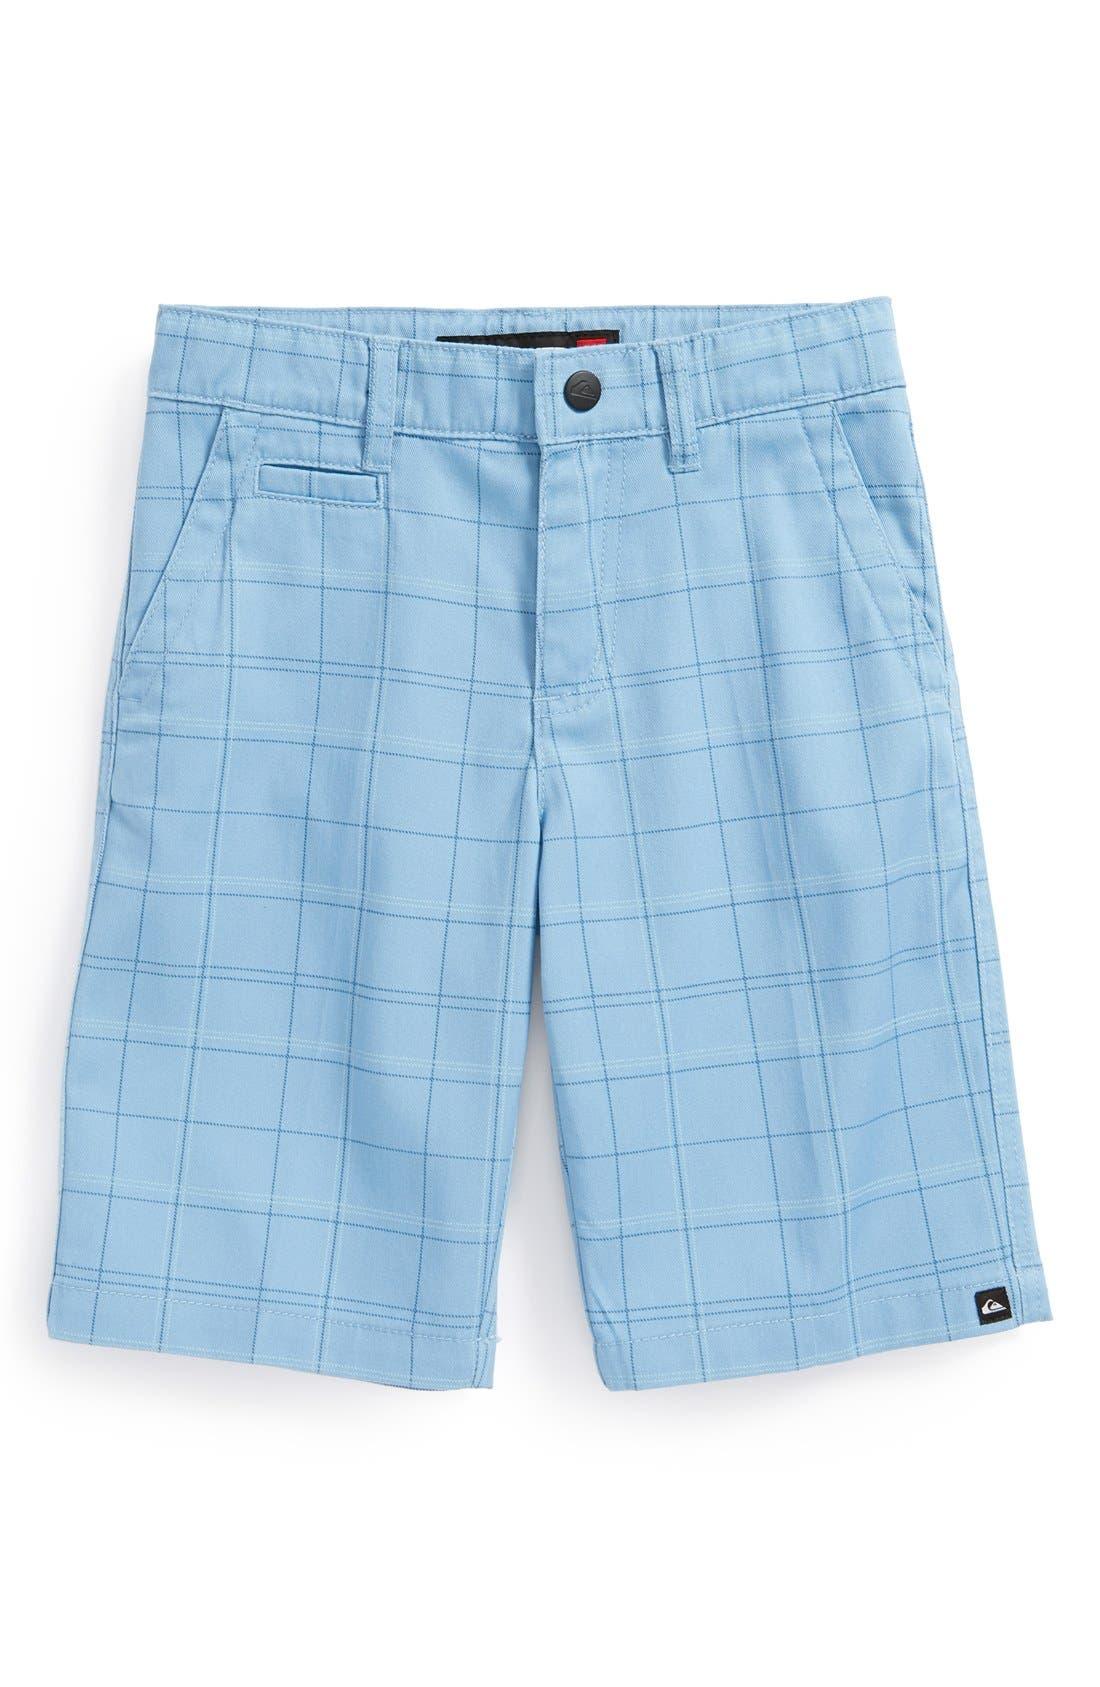 Alternate Image 1 Selected - Quiksilver 'Divided Surplus' Shorts (Little Boys)